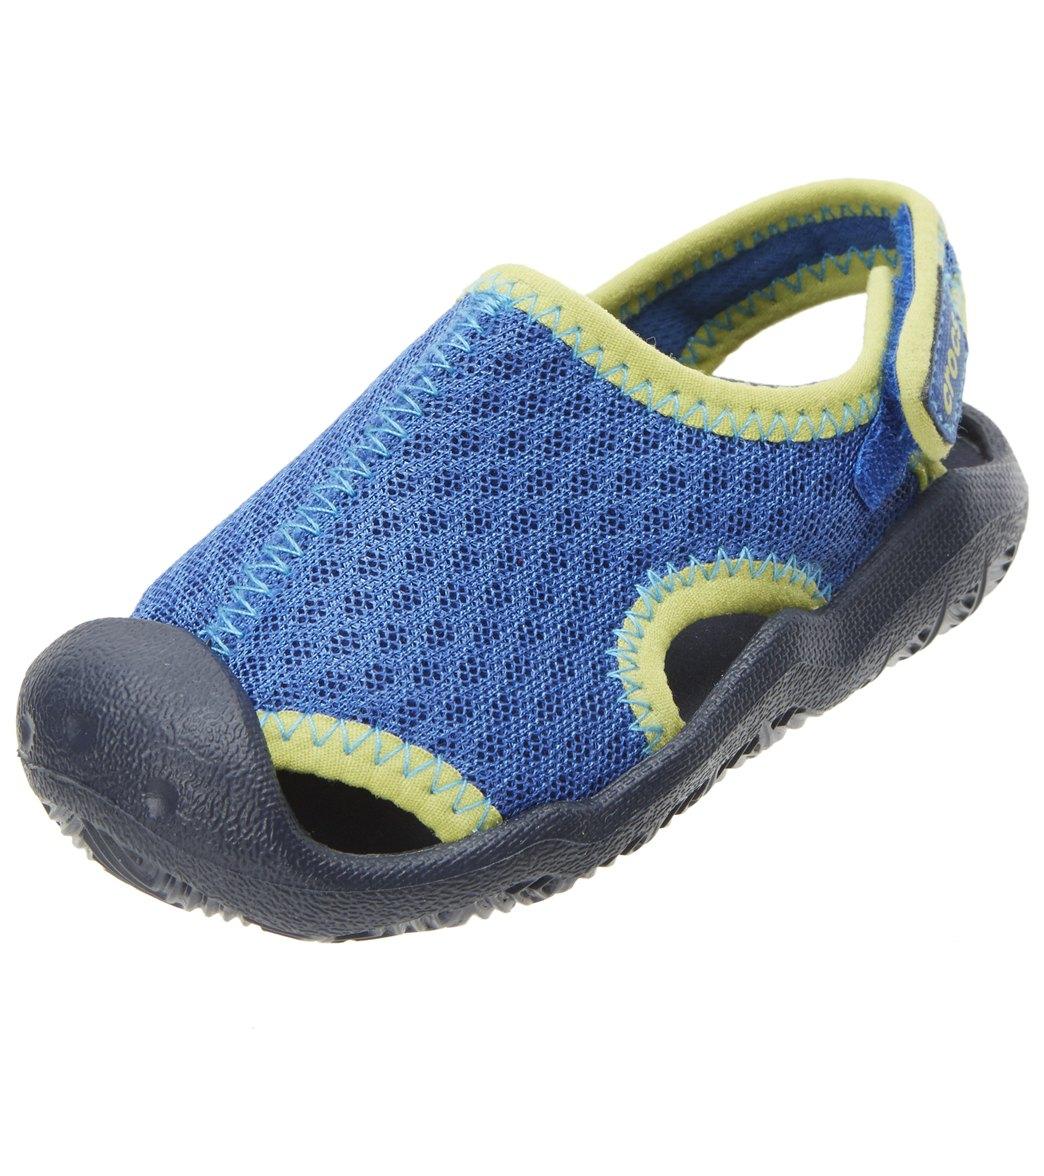 781518b0a1086 Crocs Boys  Swiftwater Sandal (Toddler